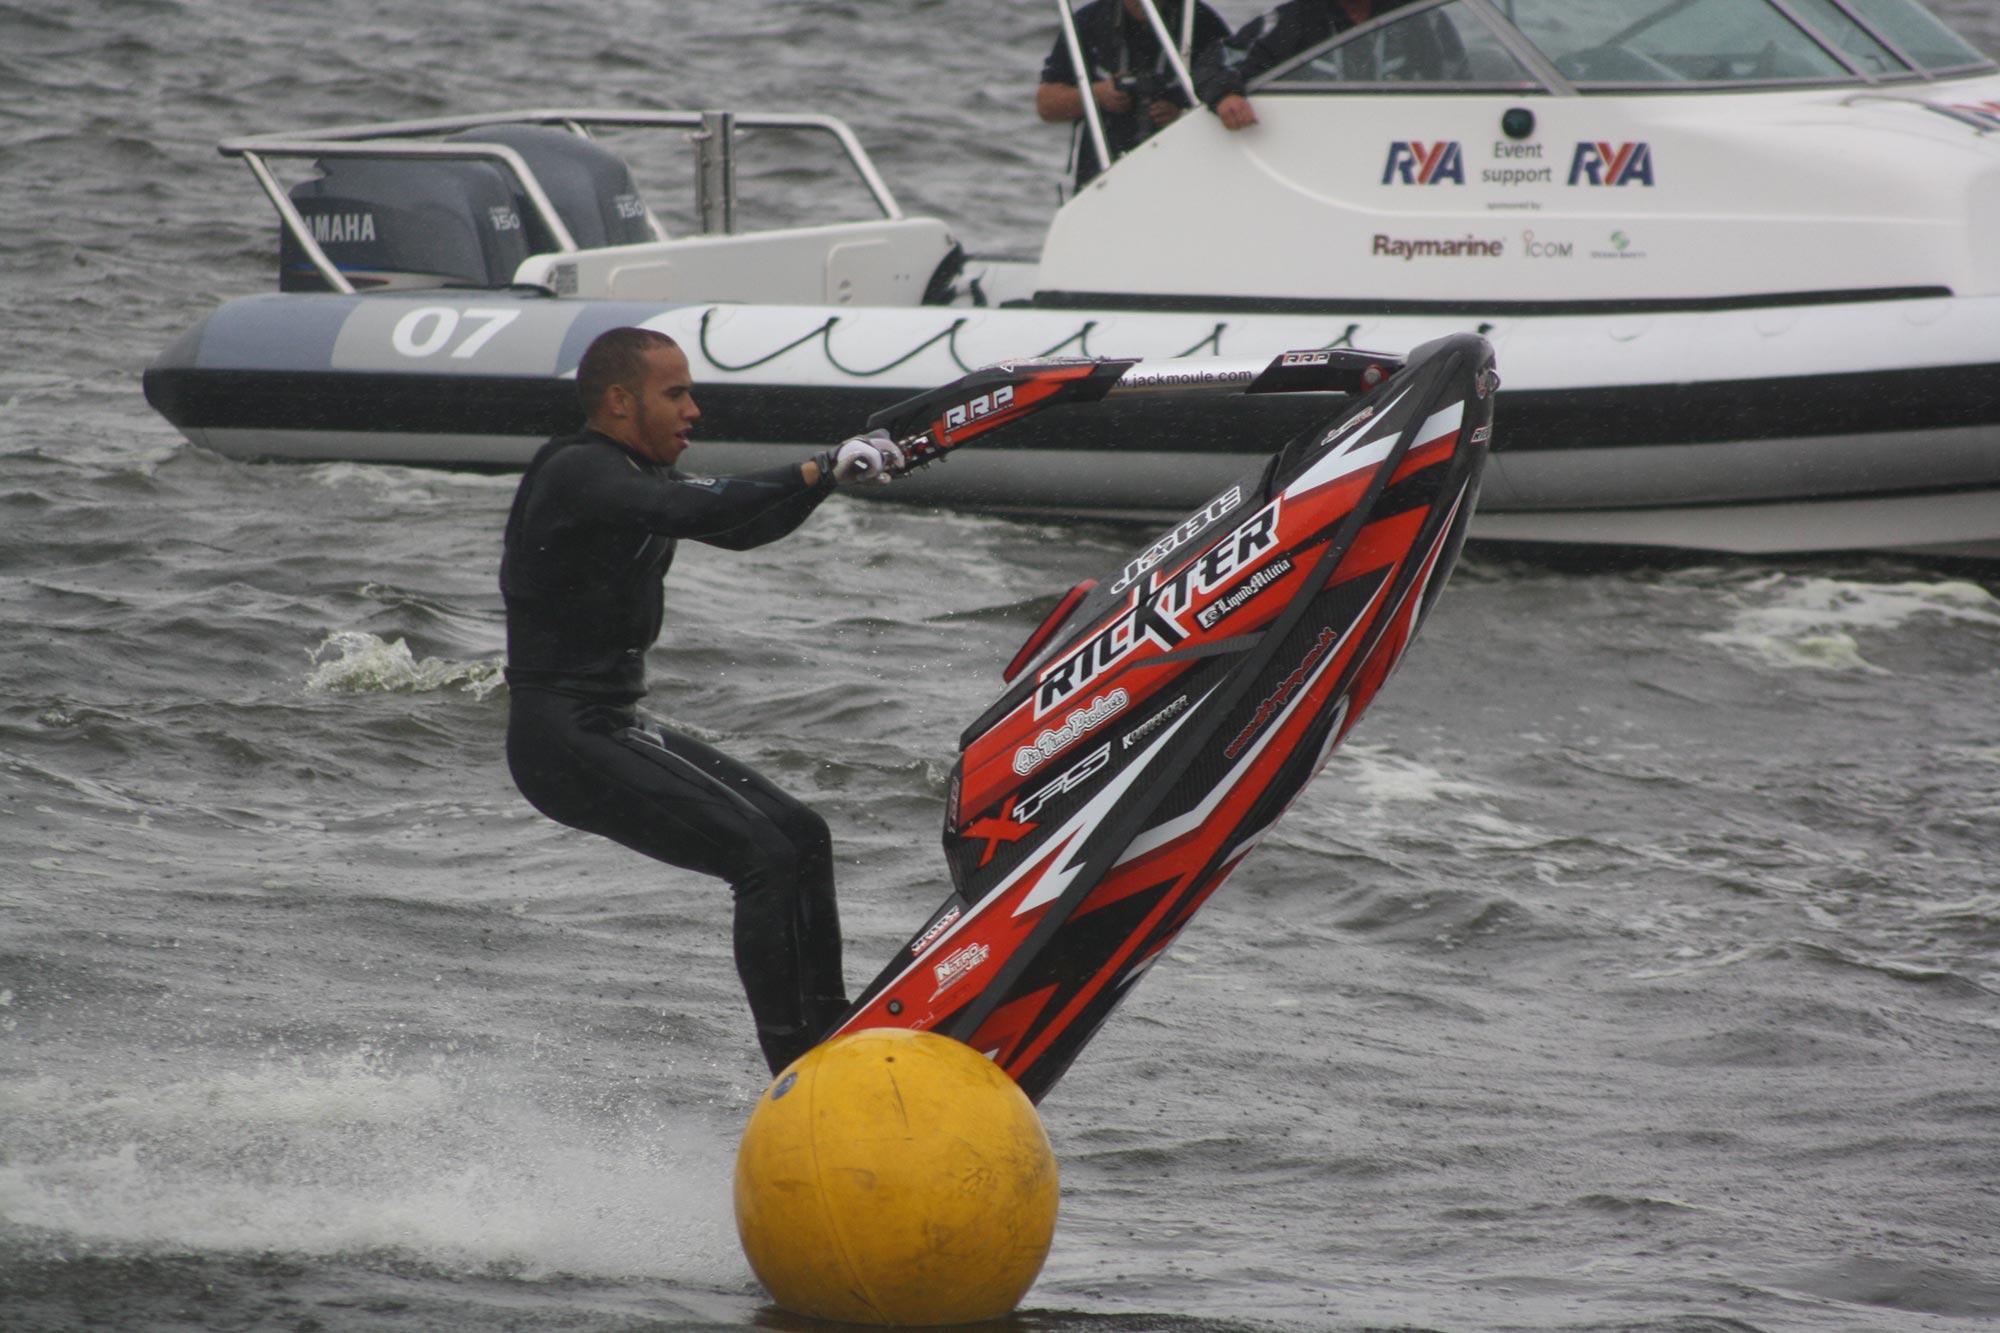 Lewis Hamilton on a jet ski in the Royal Docks